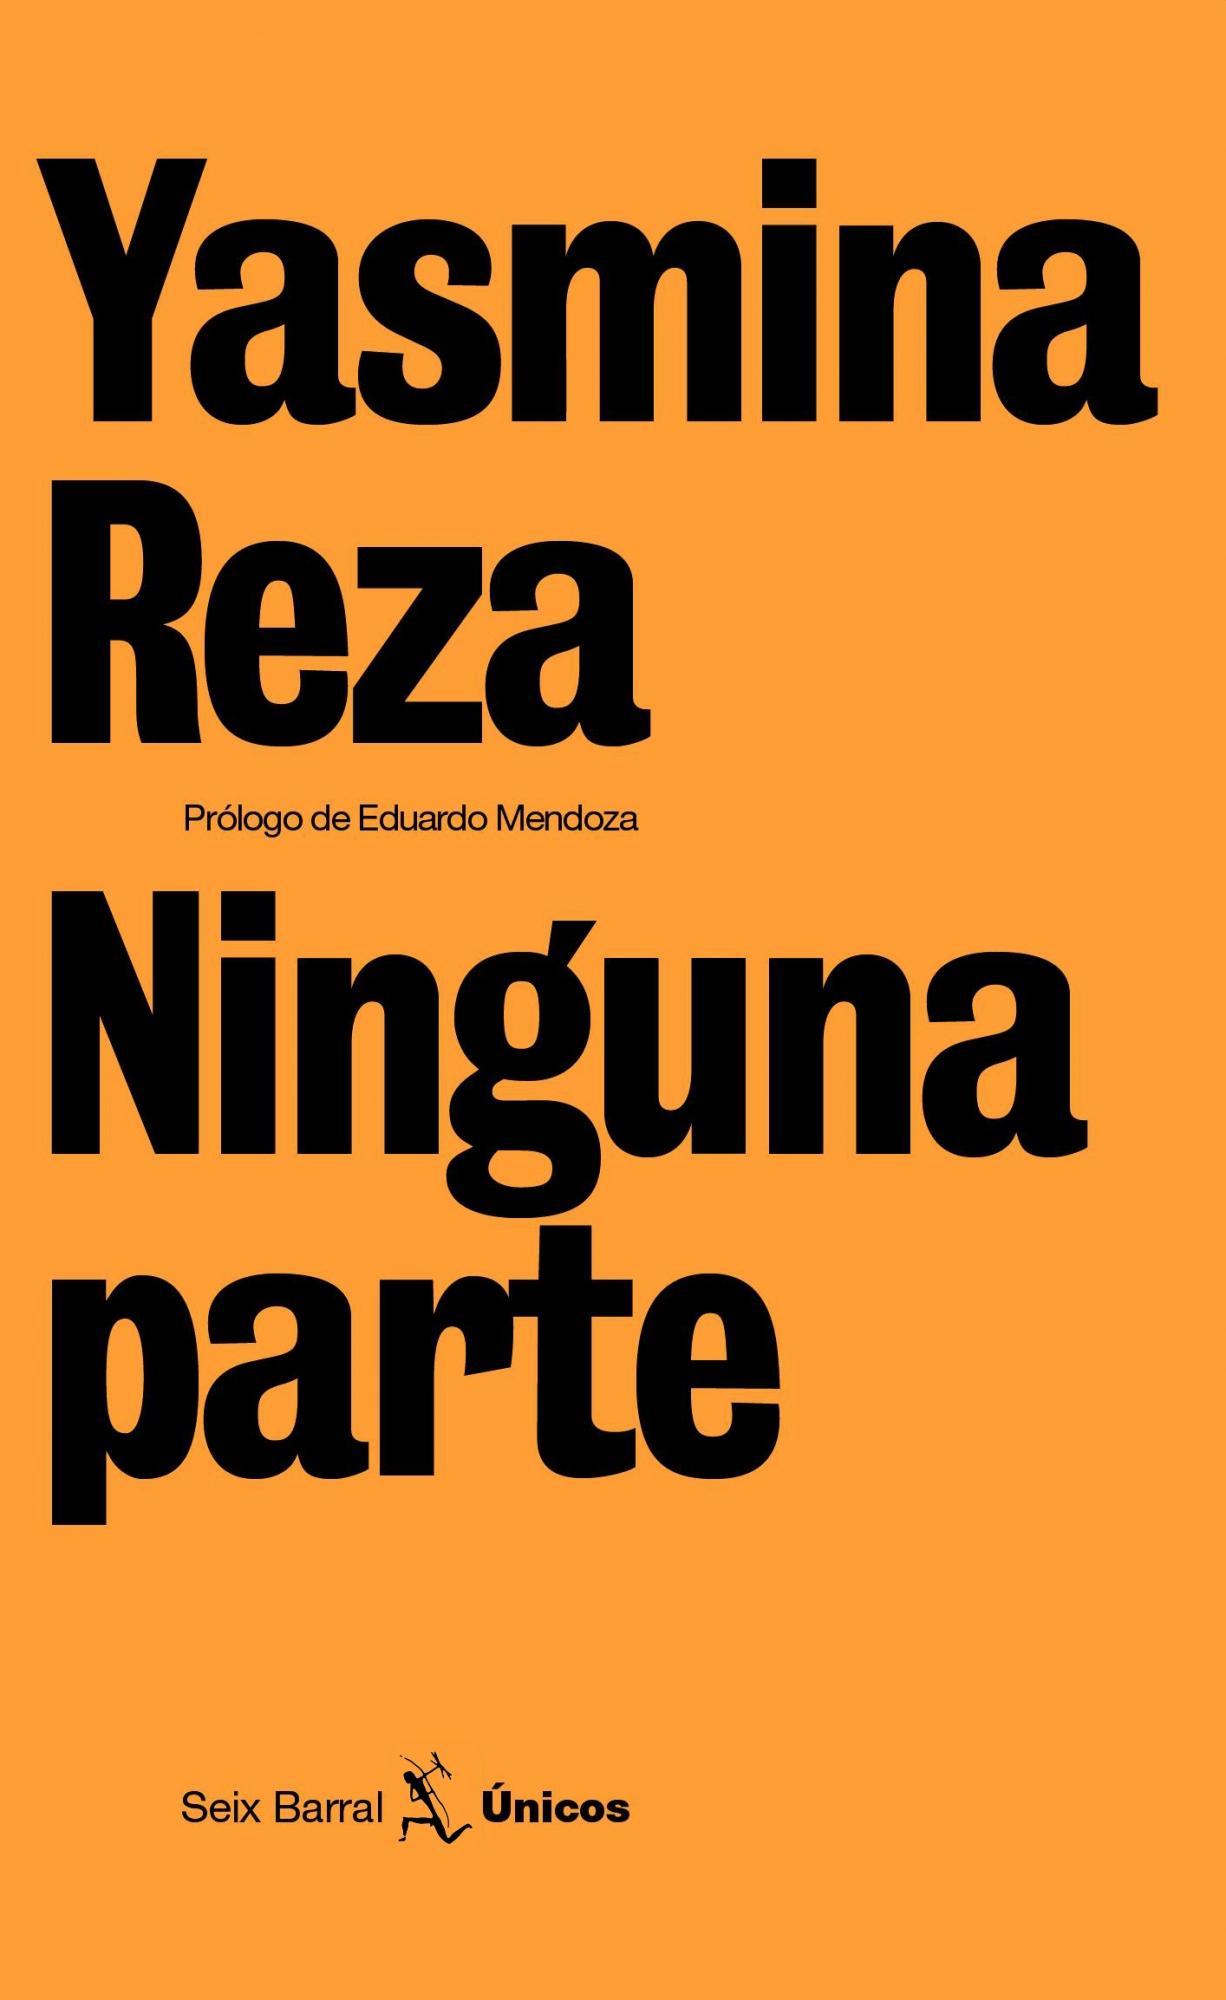 ninguna parte-yasmina reza-9788432243165